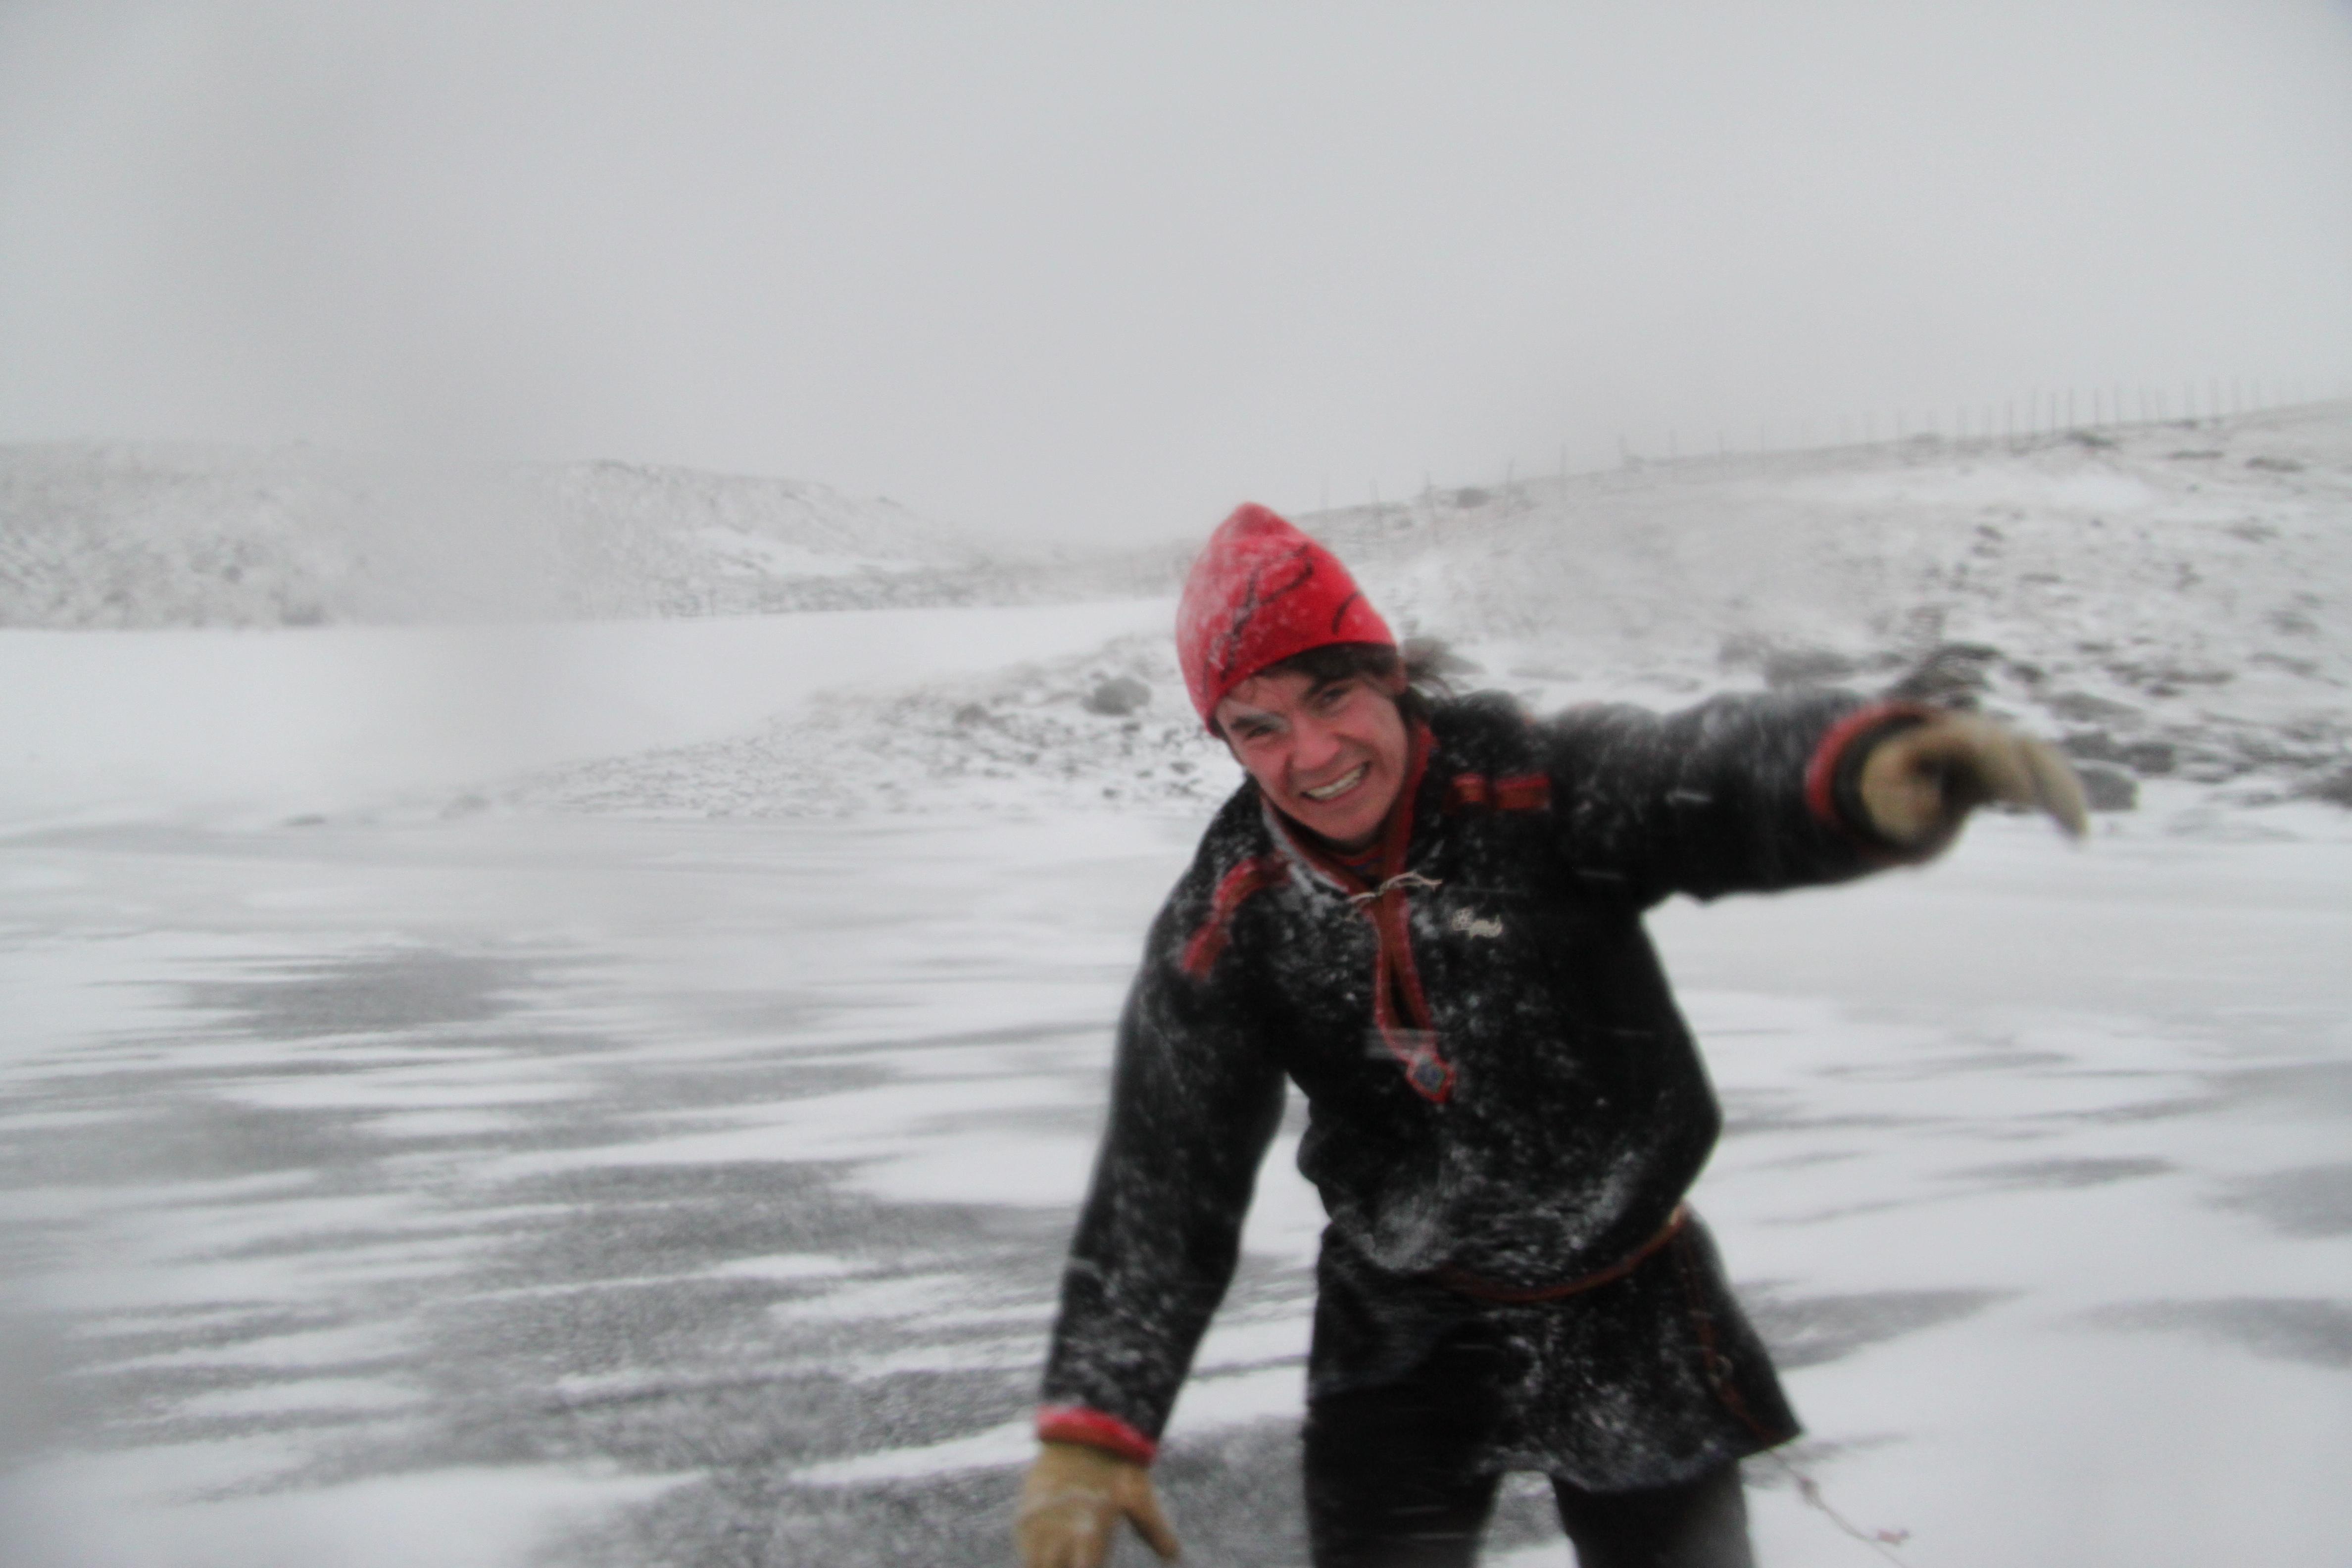 Vær, folk og kontraster i Nord-Troms Foto Isabell Taknes.jpg